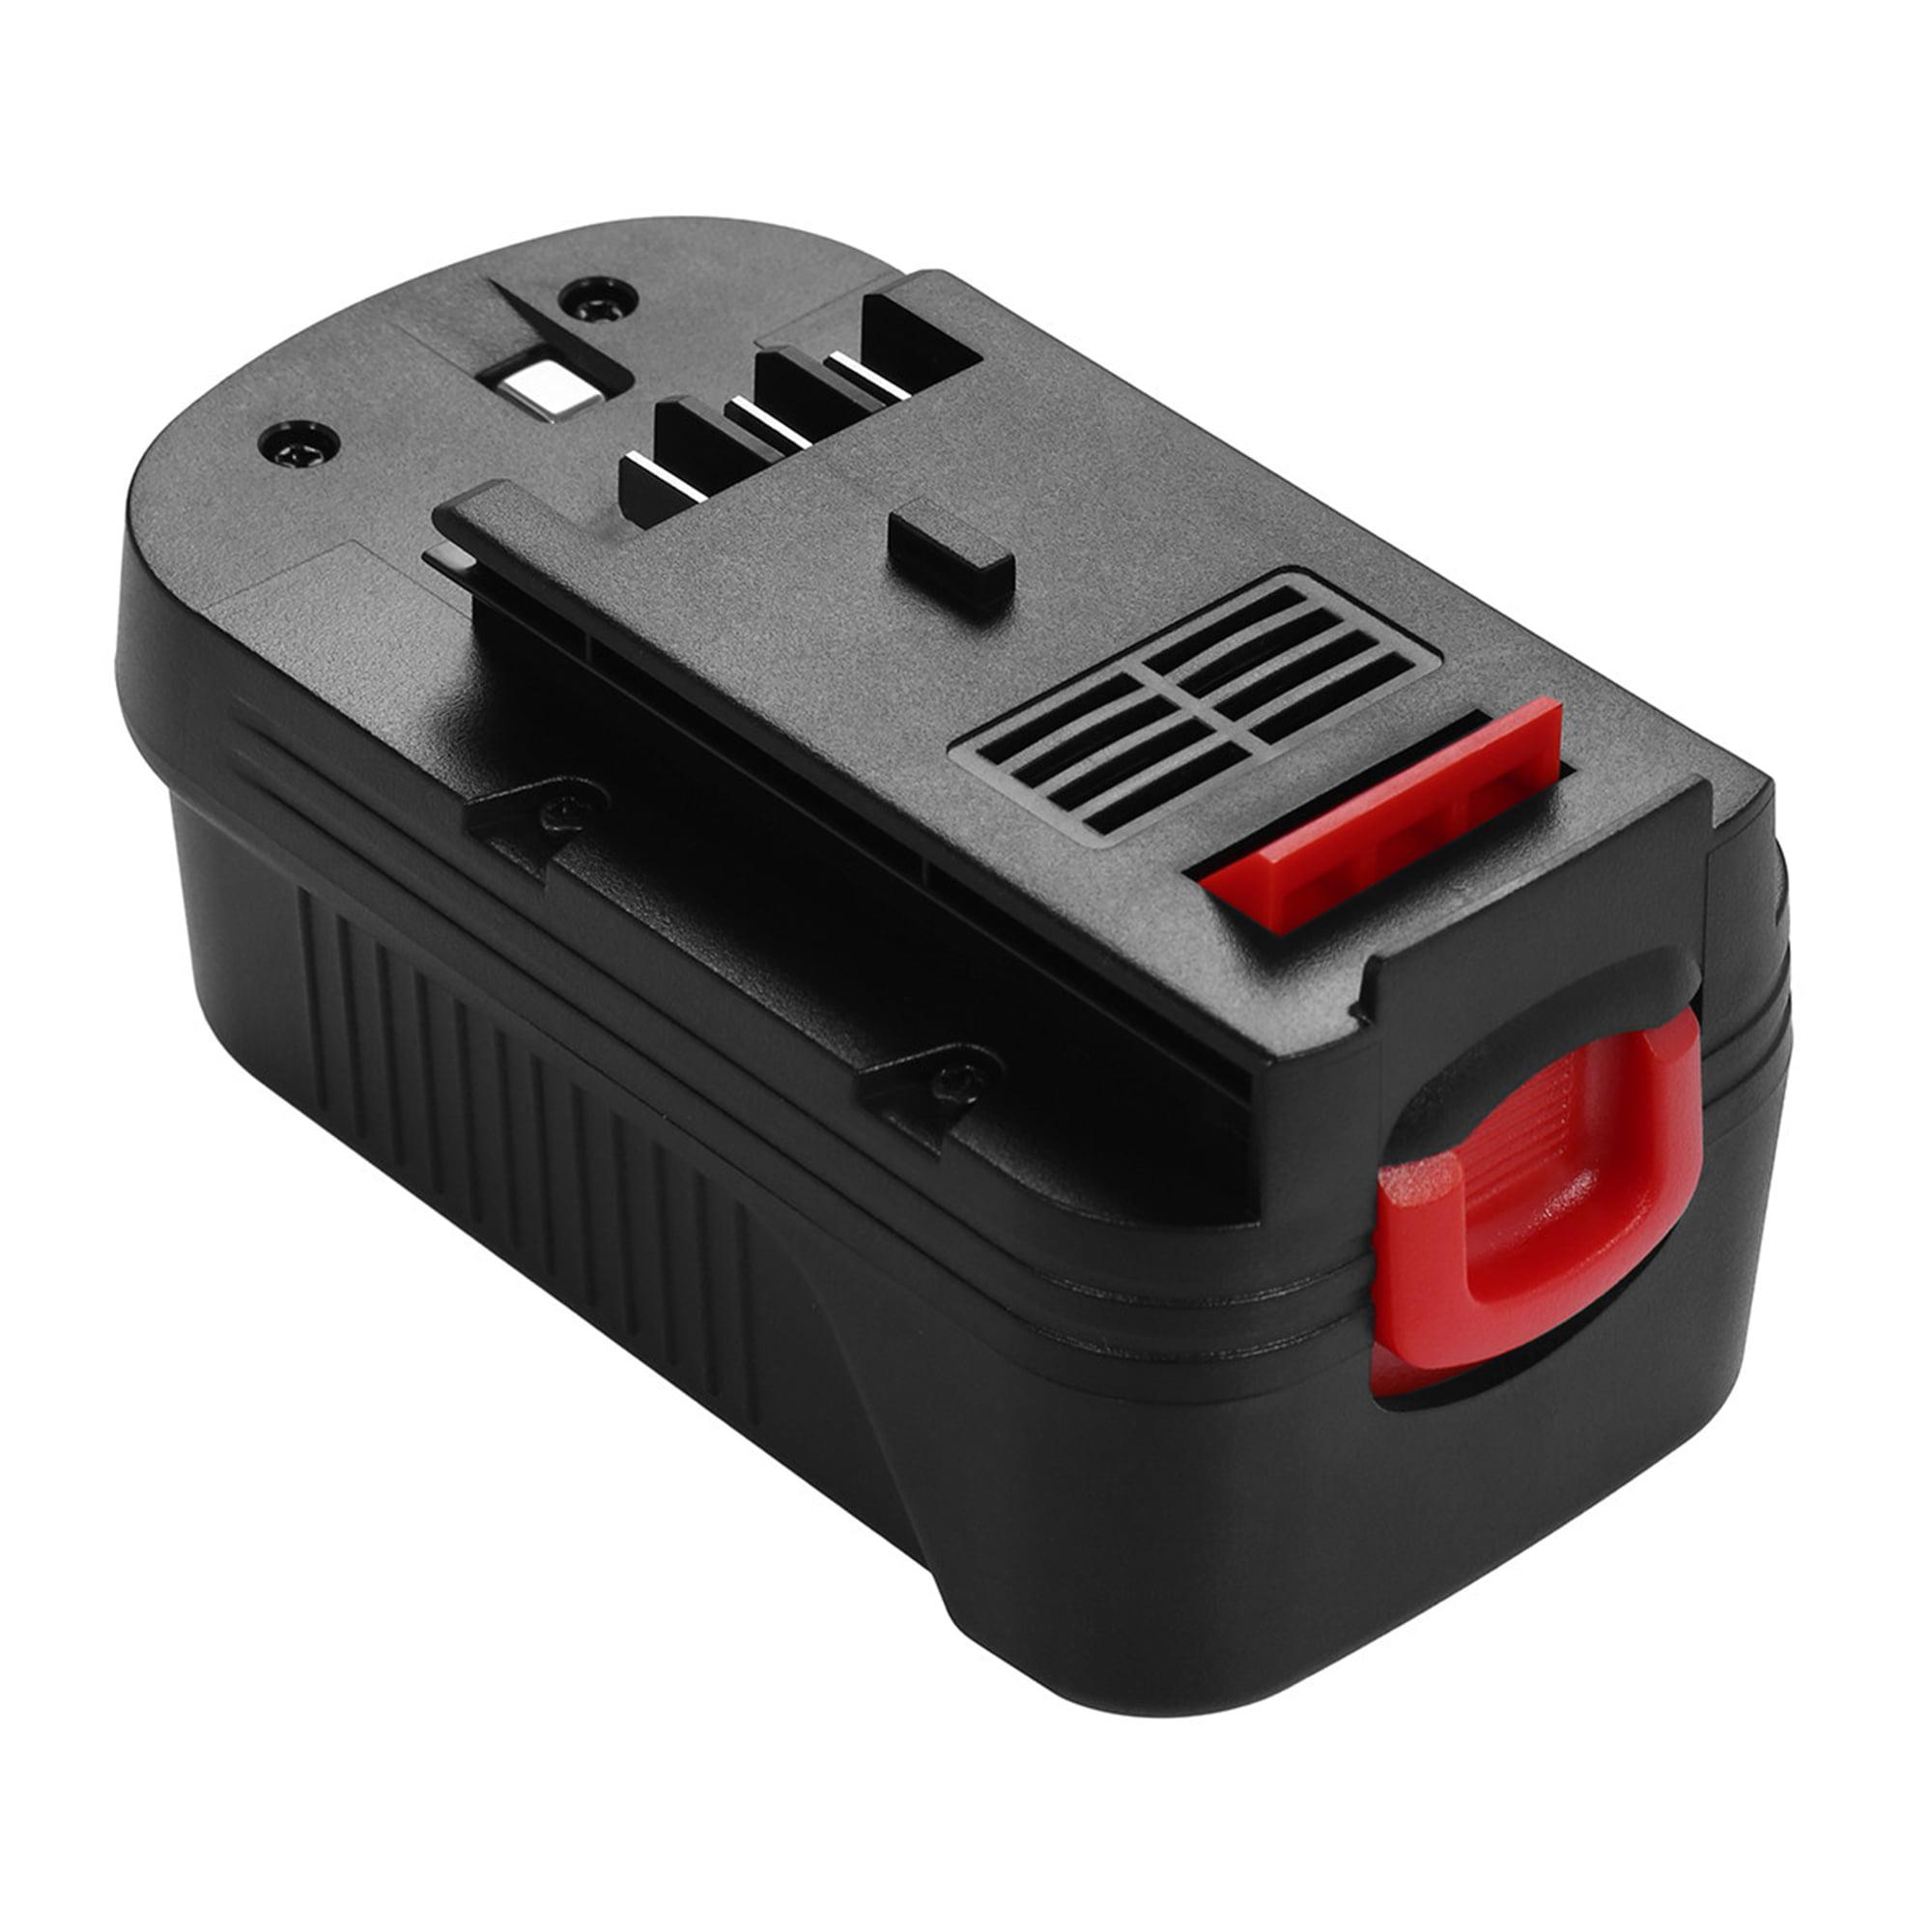 Powerextra 2000mAh 18v Replacement Battery For Black&Decker HPB18, HPB18-OPE, 244760-00, A1718, A18, A18E Firestorm FS180BX, FS18BX, FS18FL, FSB18, NST2118 Black and Decker Power Tools Batteries